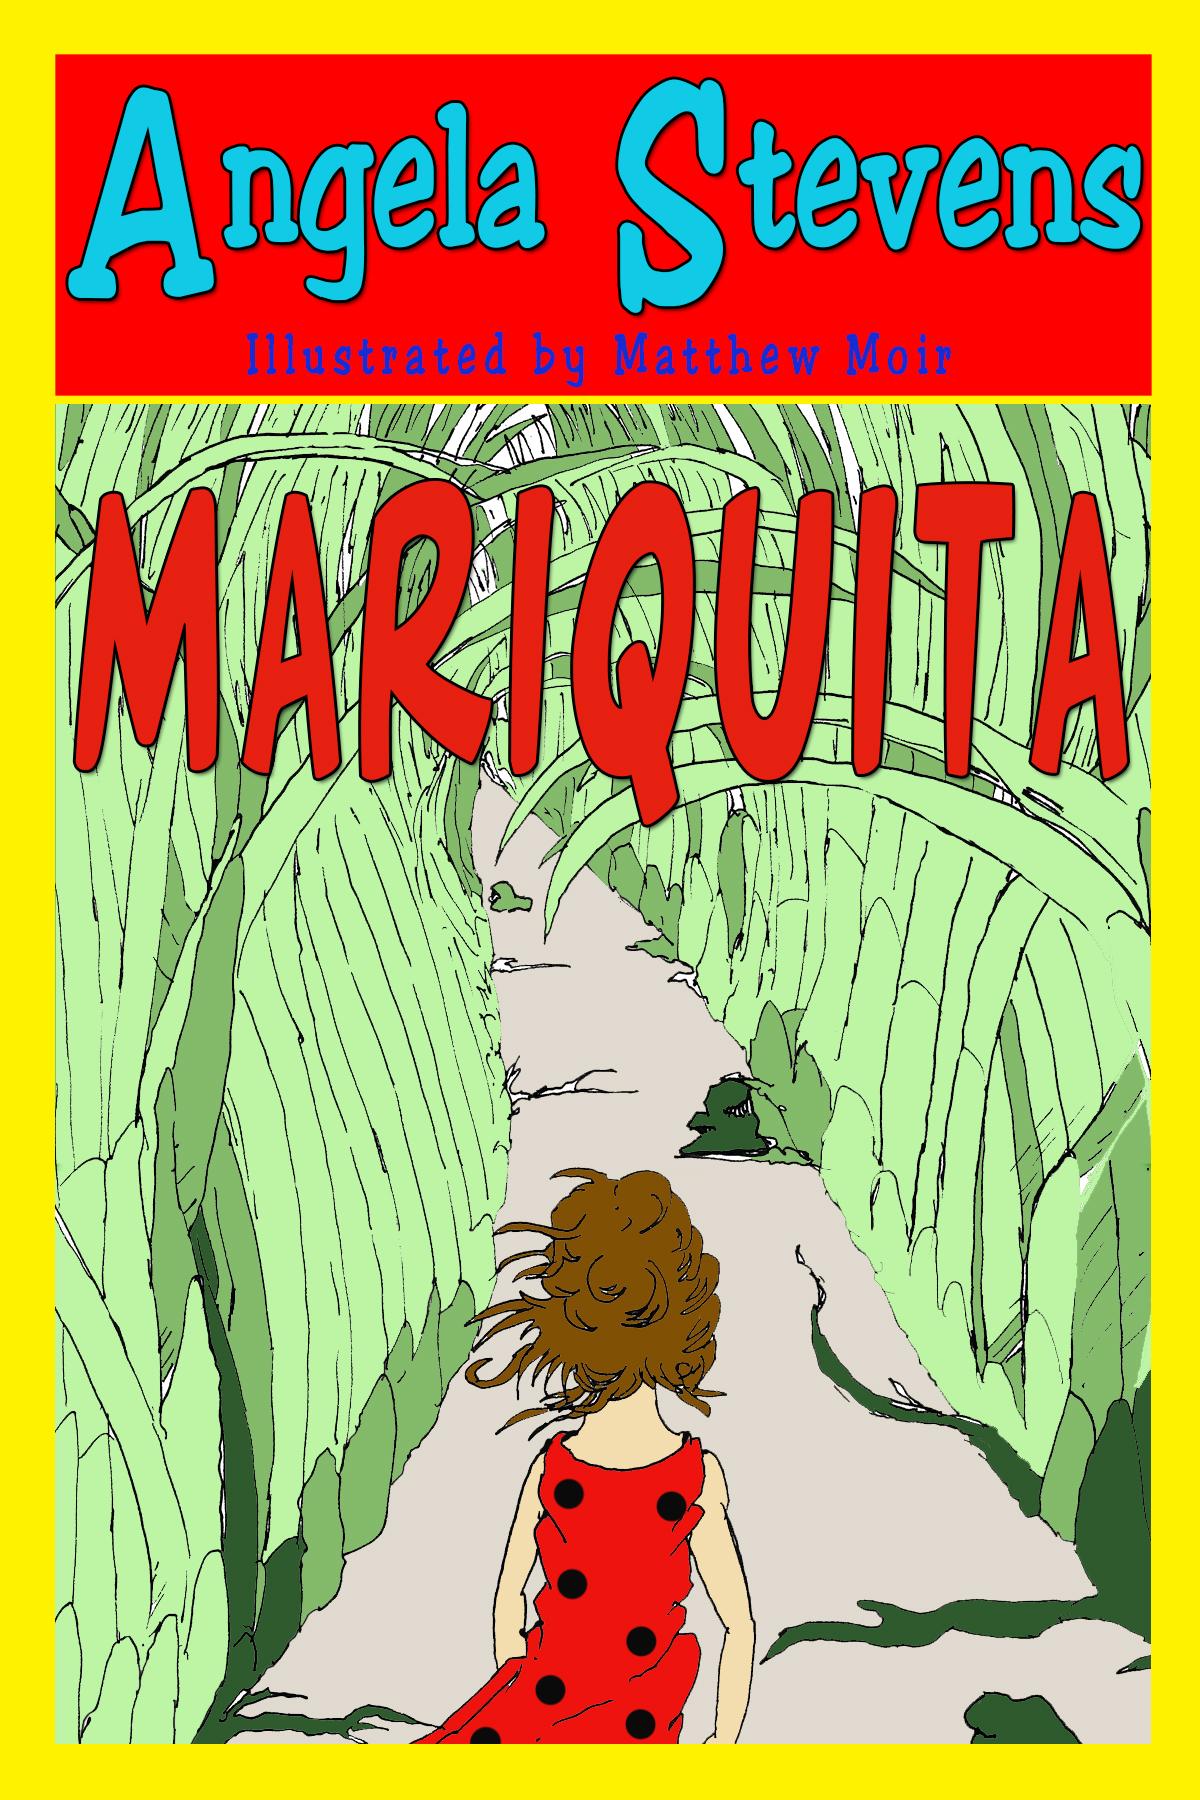 Mariquita mock up.jpg